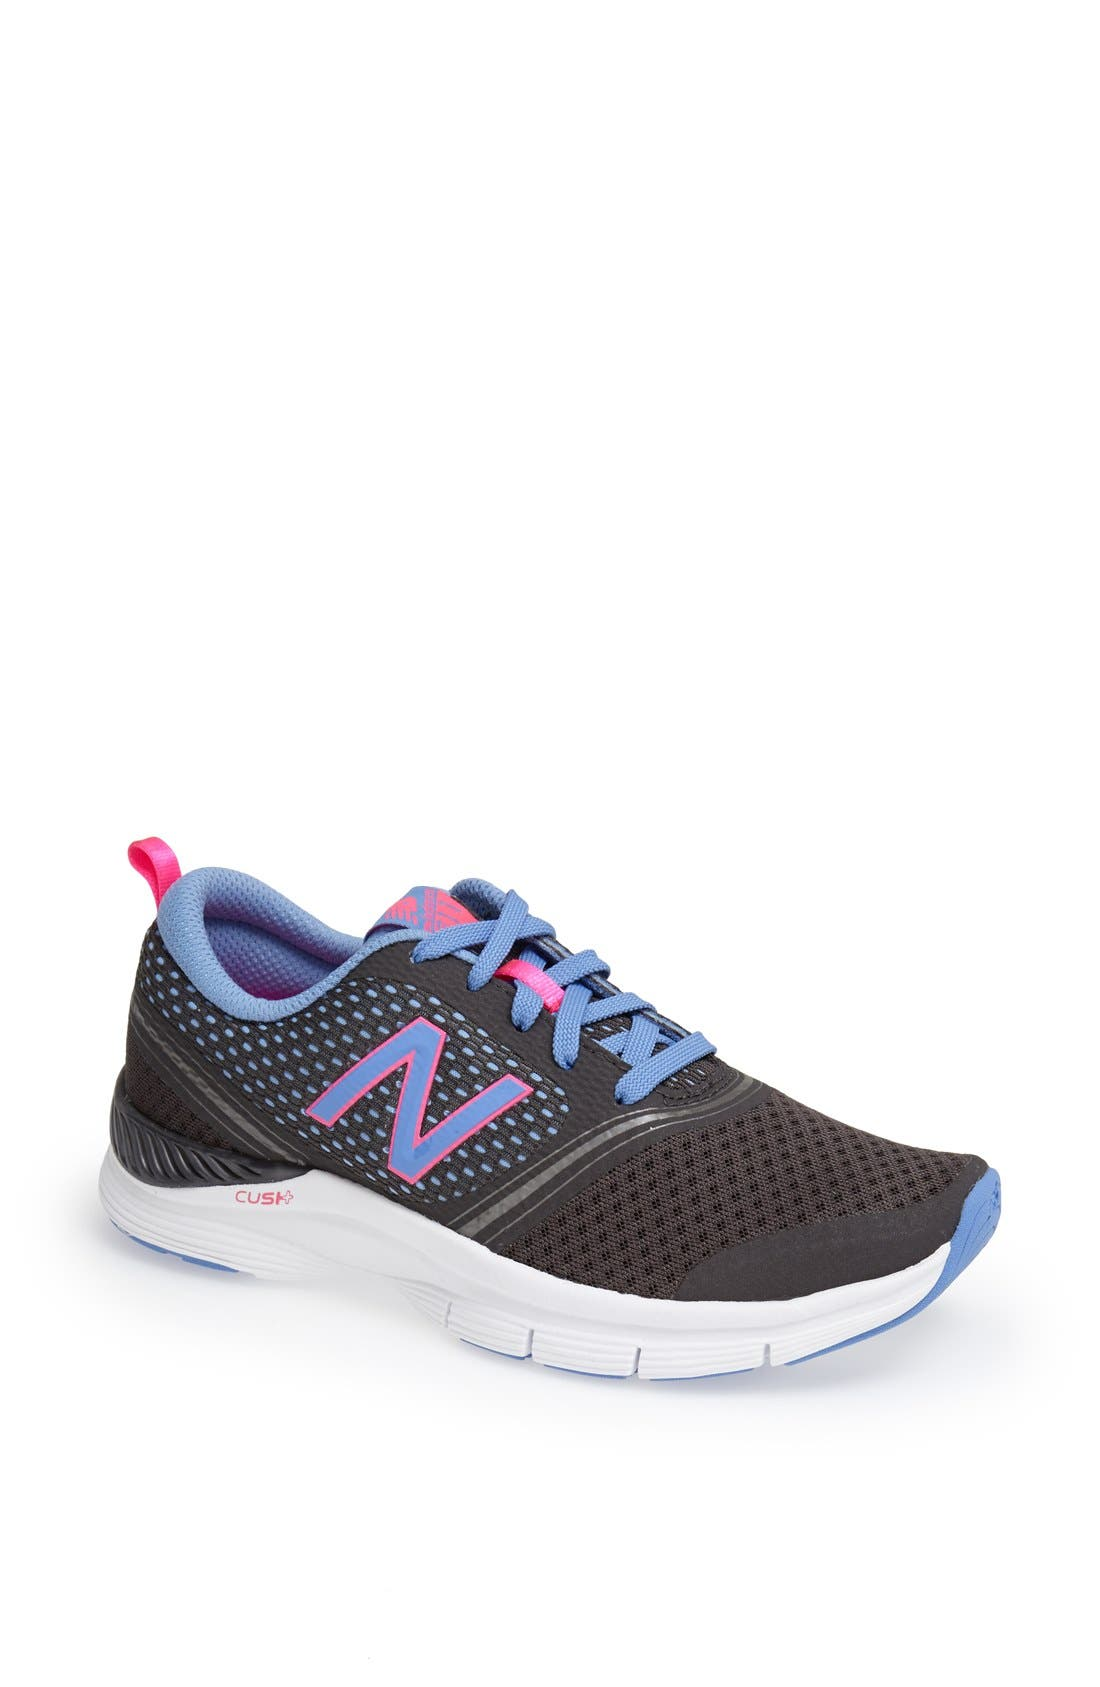 Alternate Image 1 Selected - New Balance 'WX711' Running Shoe (Women)